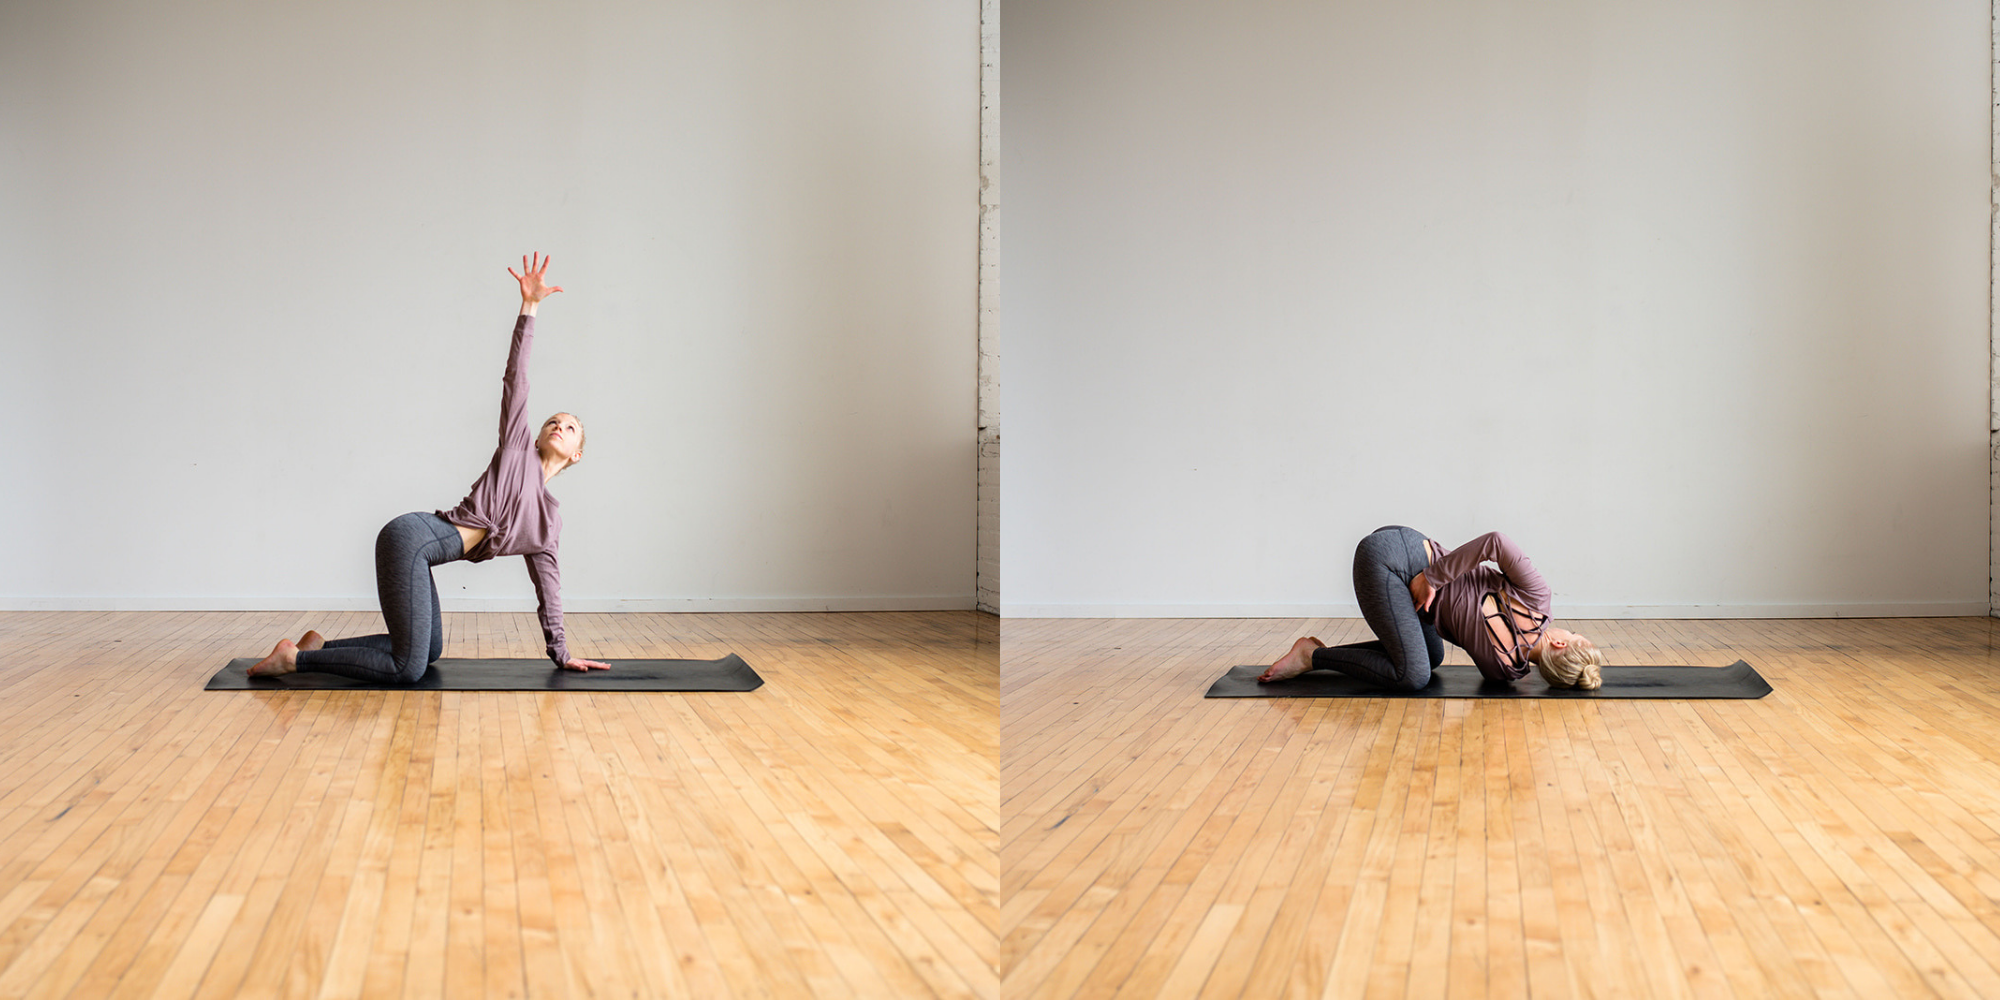 Thread The Needle, Yoga Posture, Yoga Poses, Bedtime Yoga, Bedtime Yoga Routine, Define Fettle